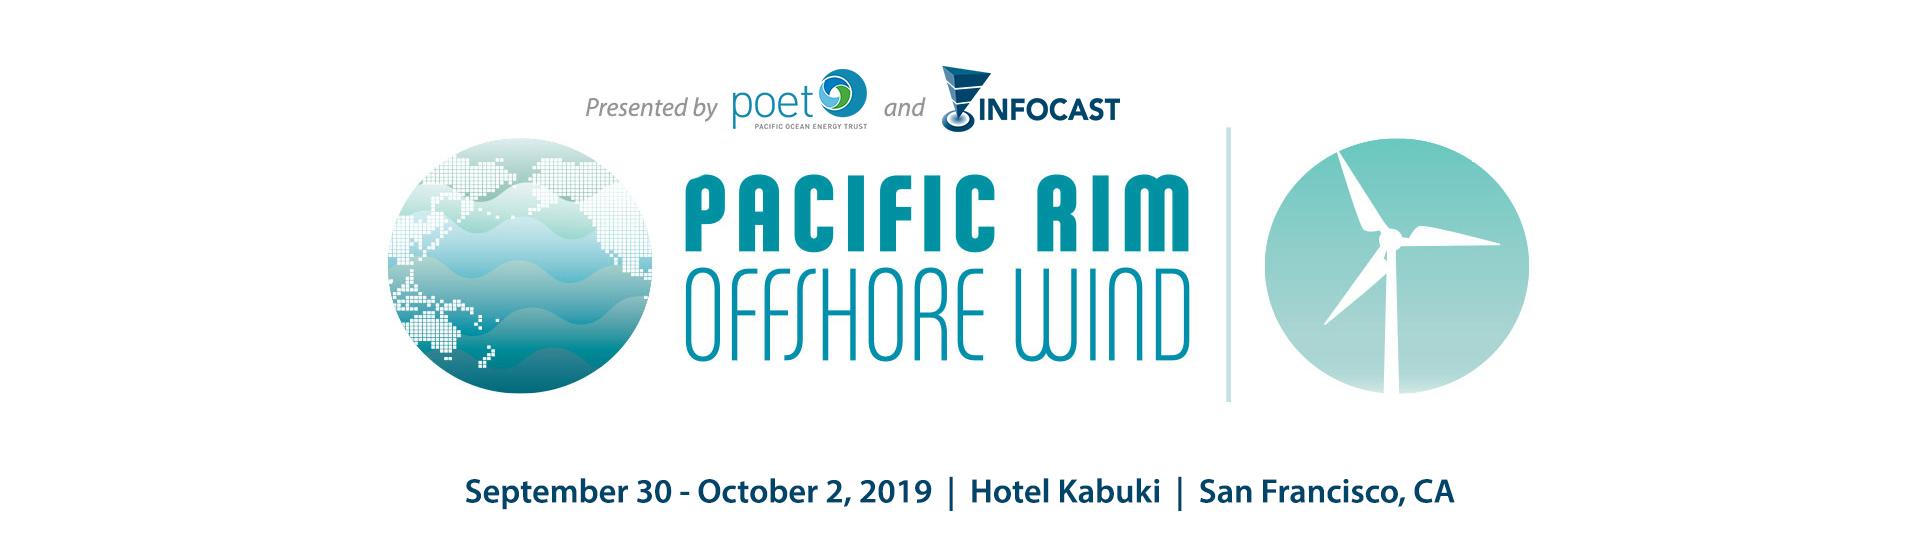 Pacific Rim Offshore Wind